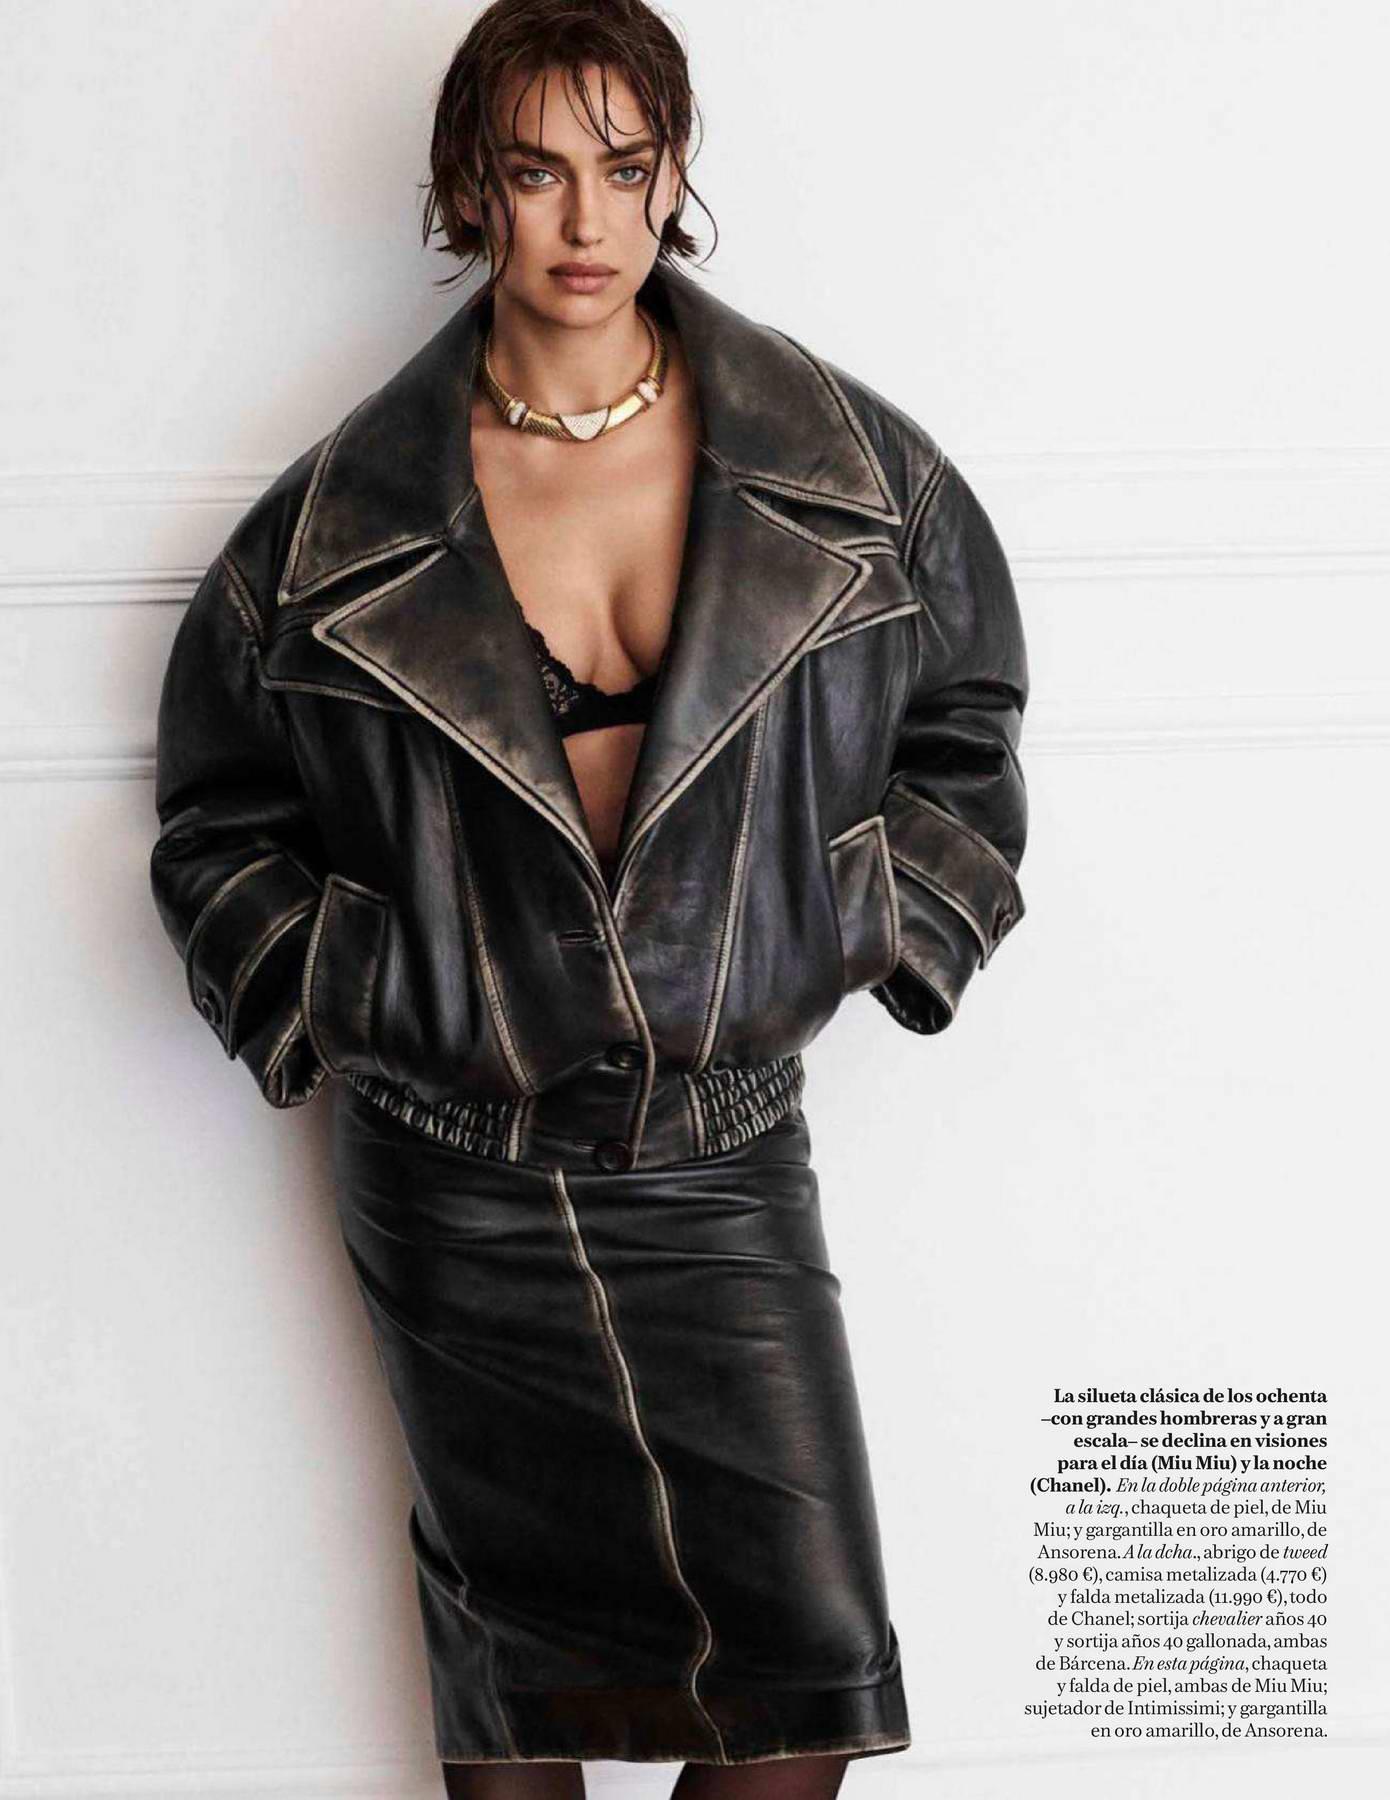 Irina Shayk features in Vogue, Espana - September 2018